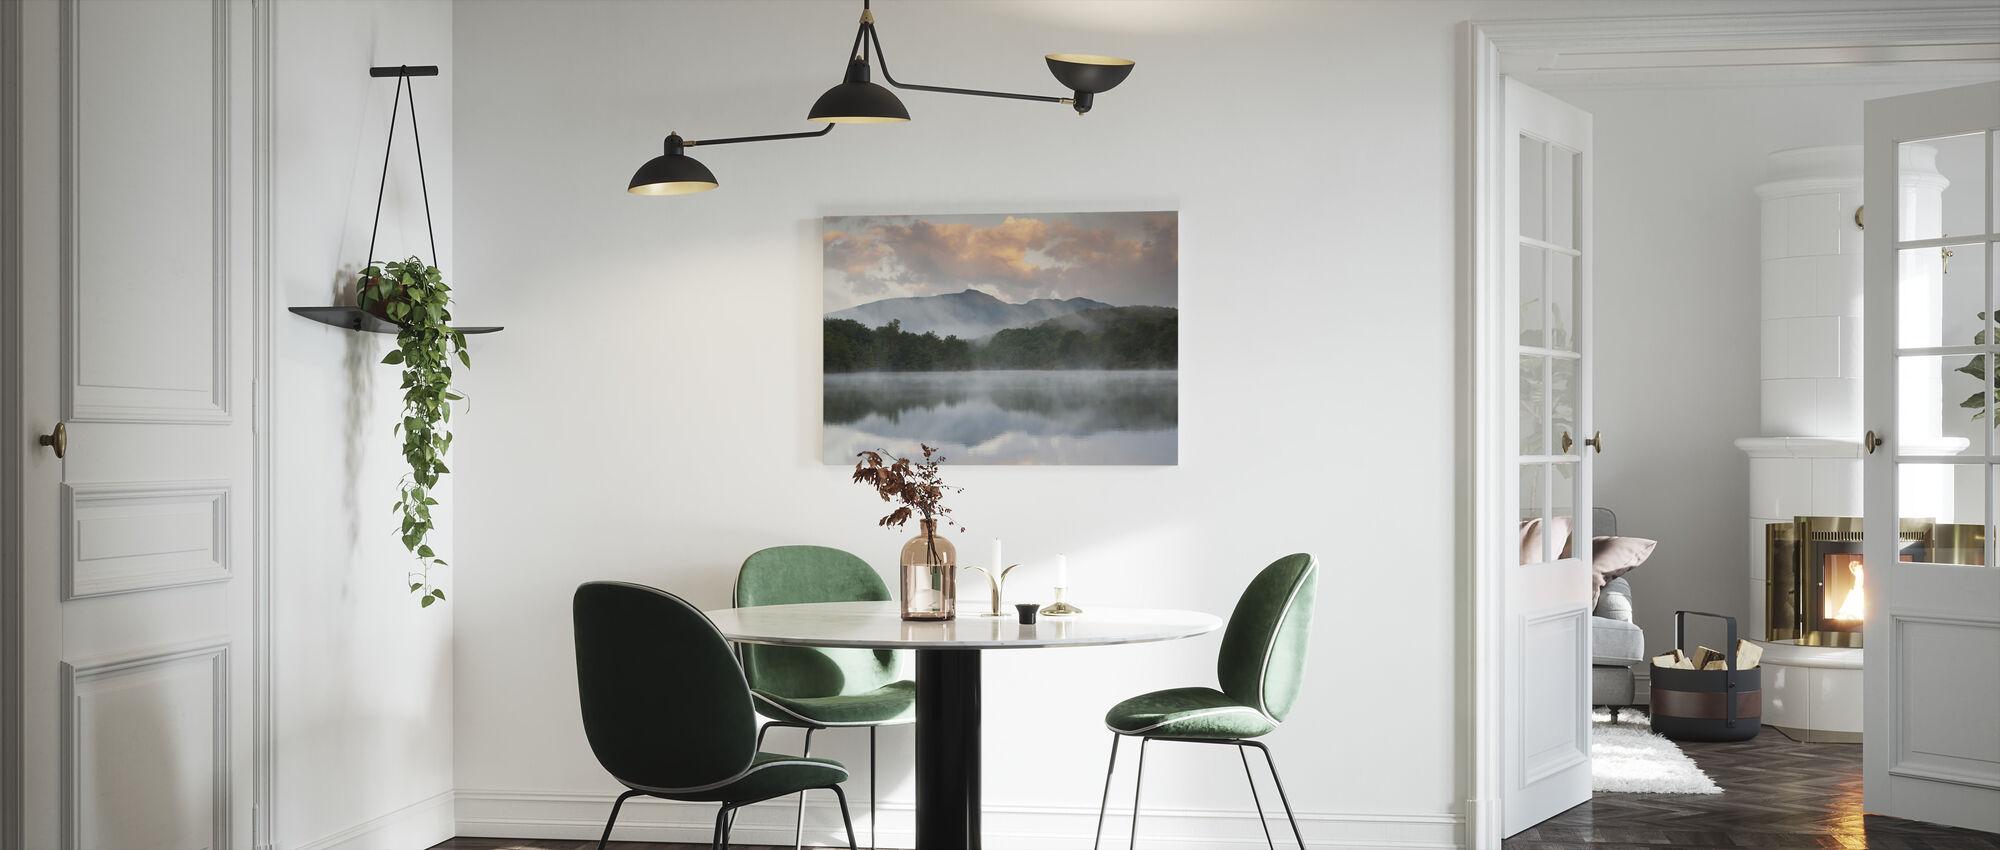 Mountain Lake Reflection of Blue Ridge - Canvas print - Kitchen